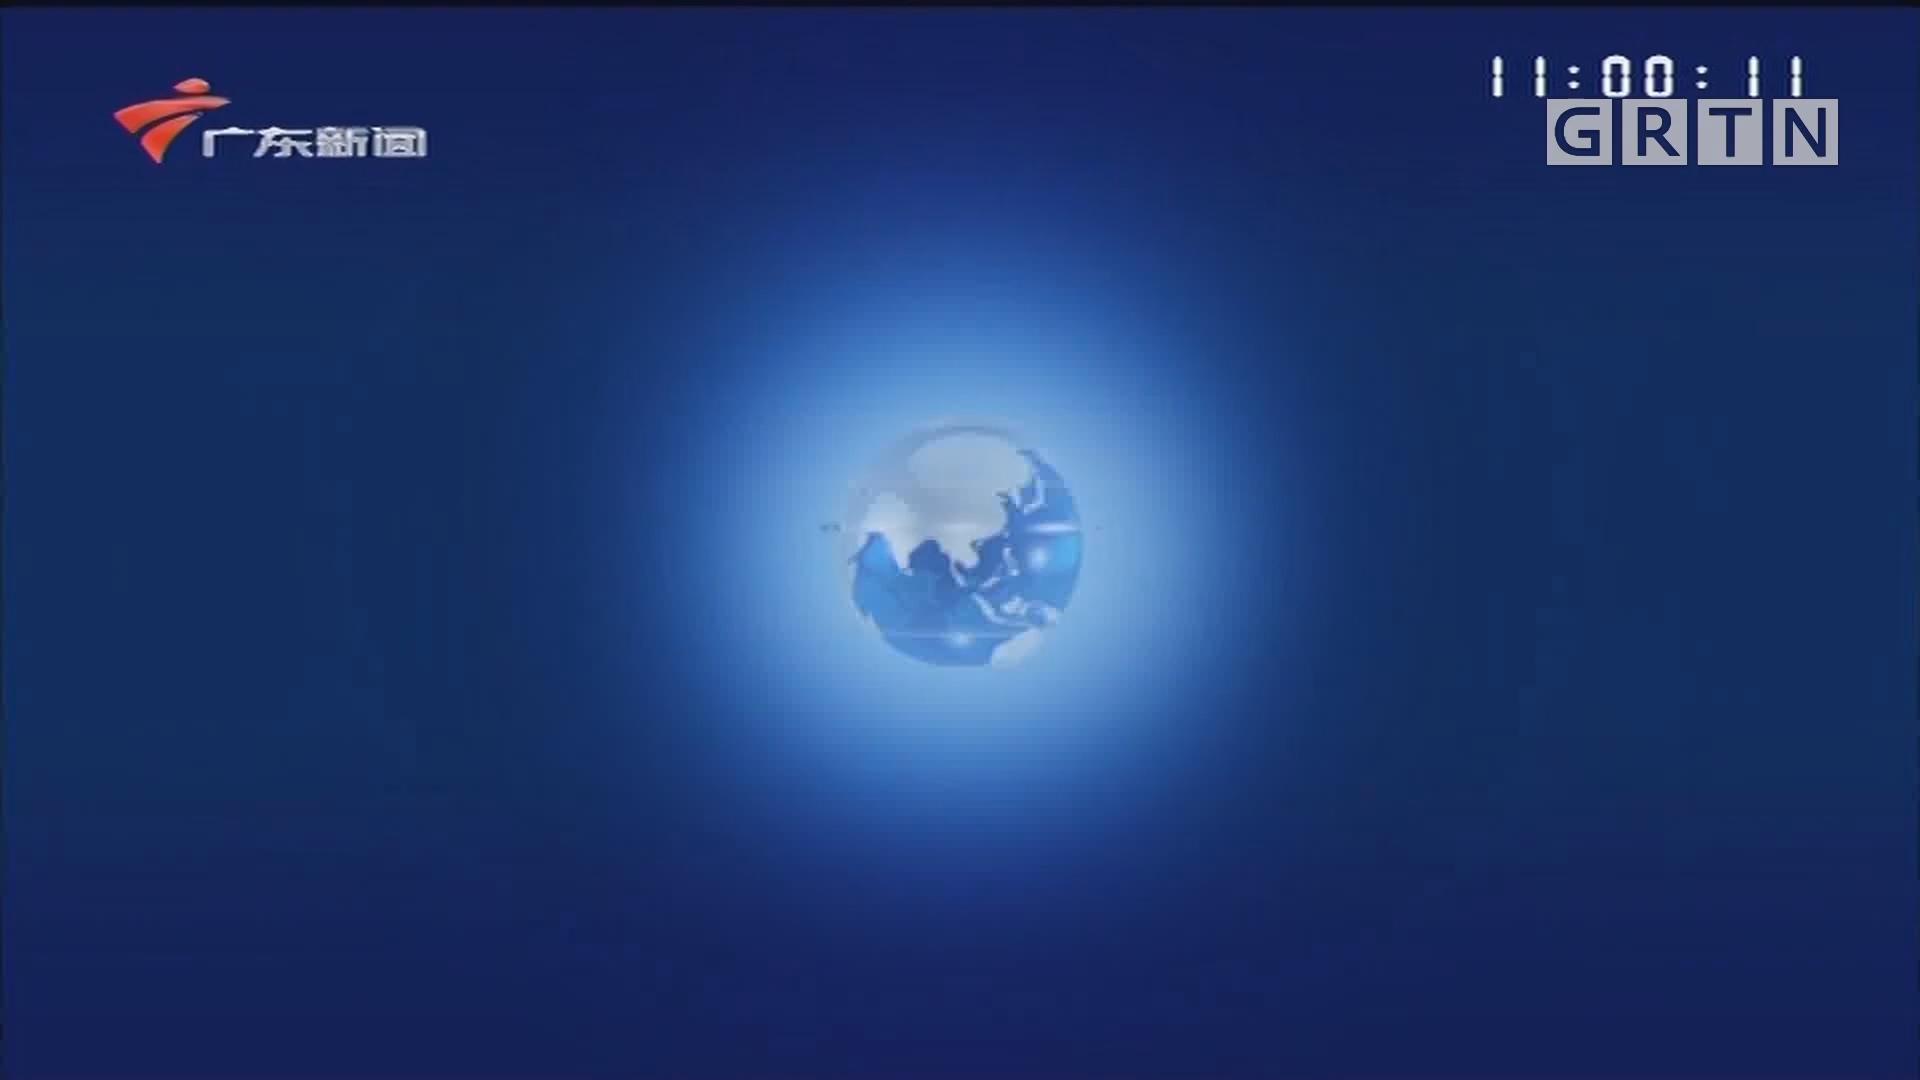 [HD][2020-06-03-11:00]正点播报:自然资源部 国家税务总局 中国银保监会 年底前地级及以上城市不动产网上登记